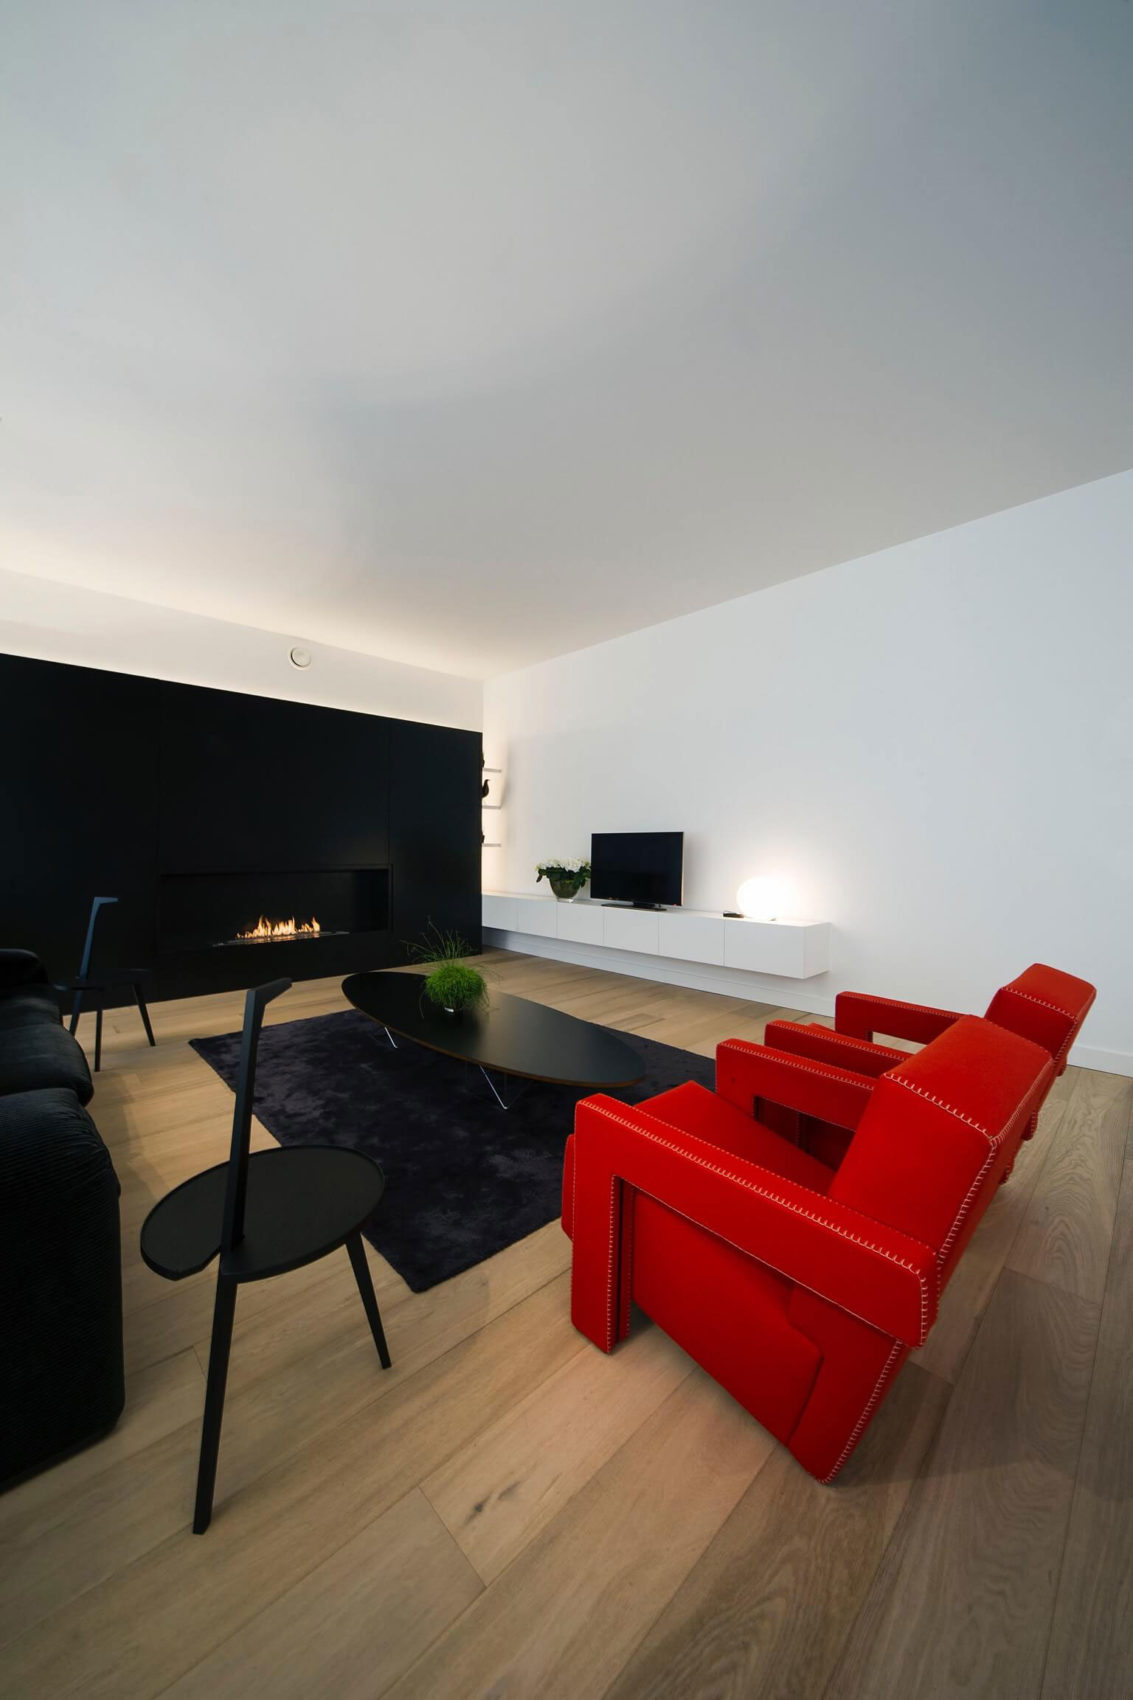 Apartment 1418 by Filip Deslee (2)